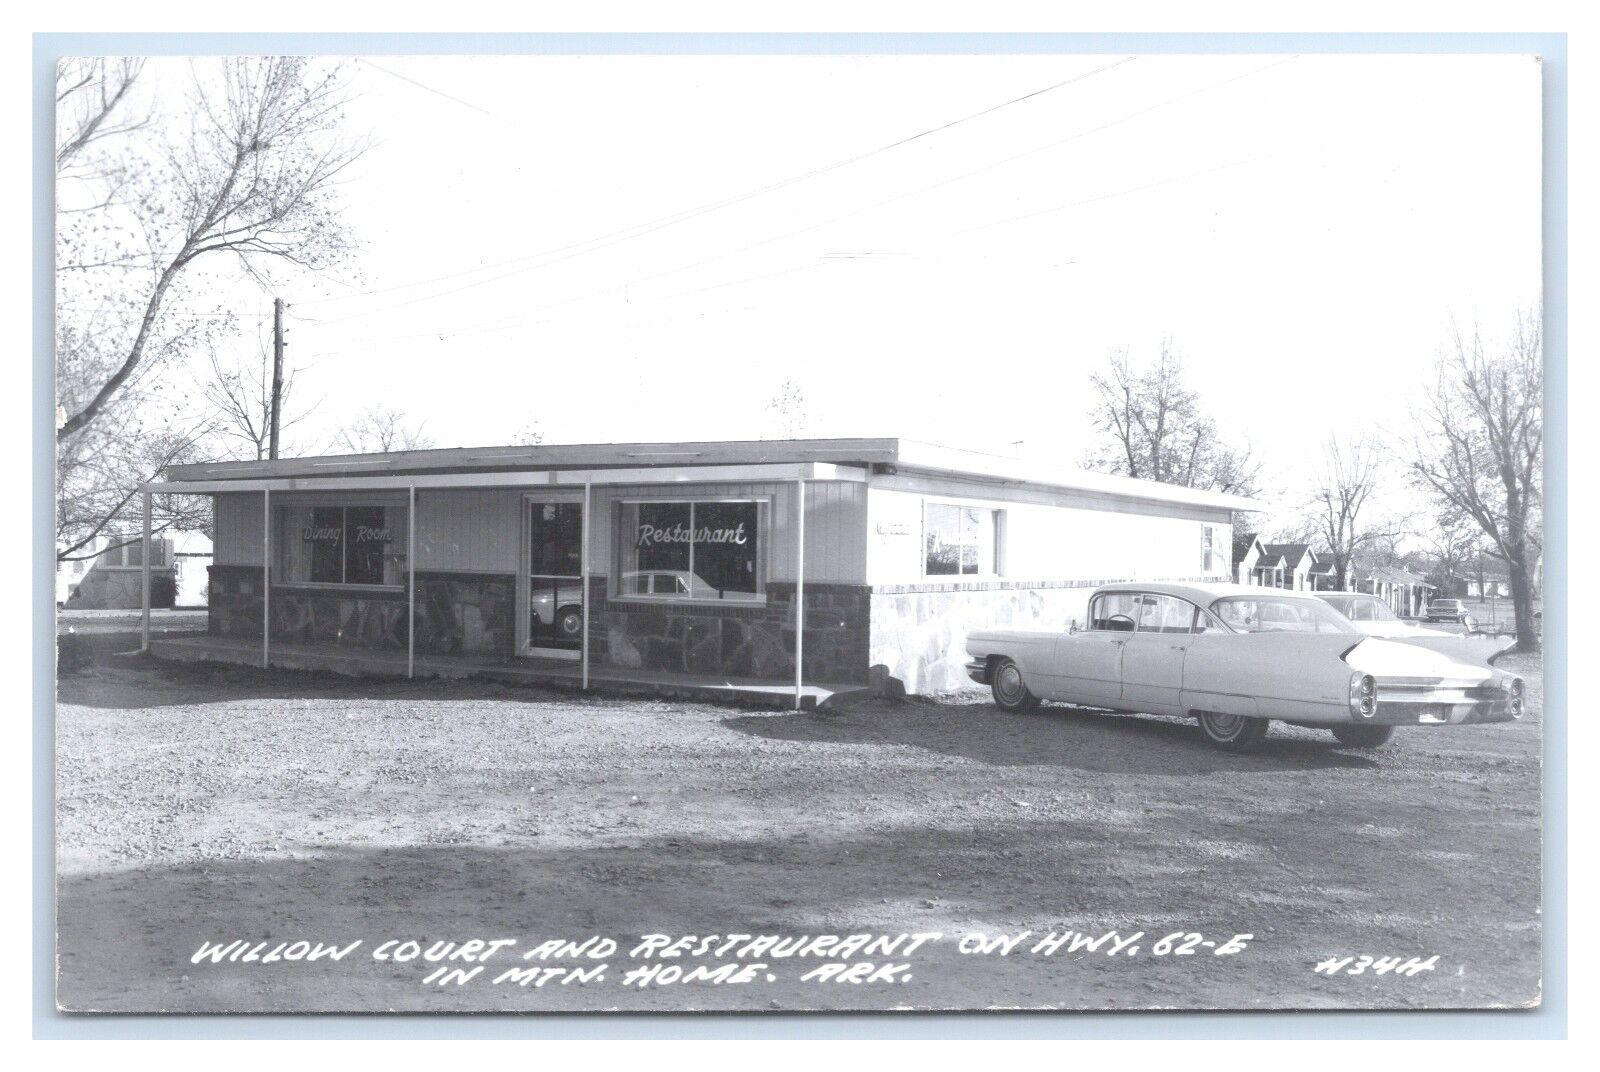 ARKANSAS MOUNTAIN HOME L.L. COOK REAL PHOTO WILLOW COURT RESTAURANT CIRCA 1958